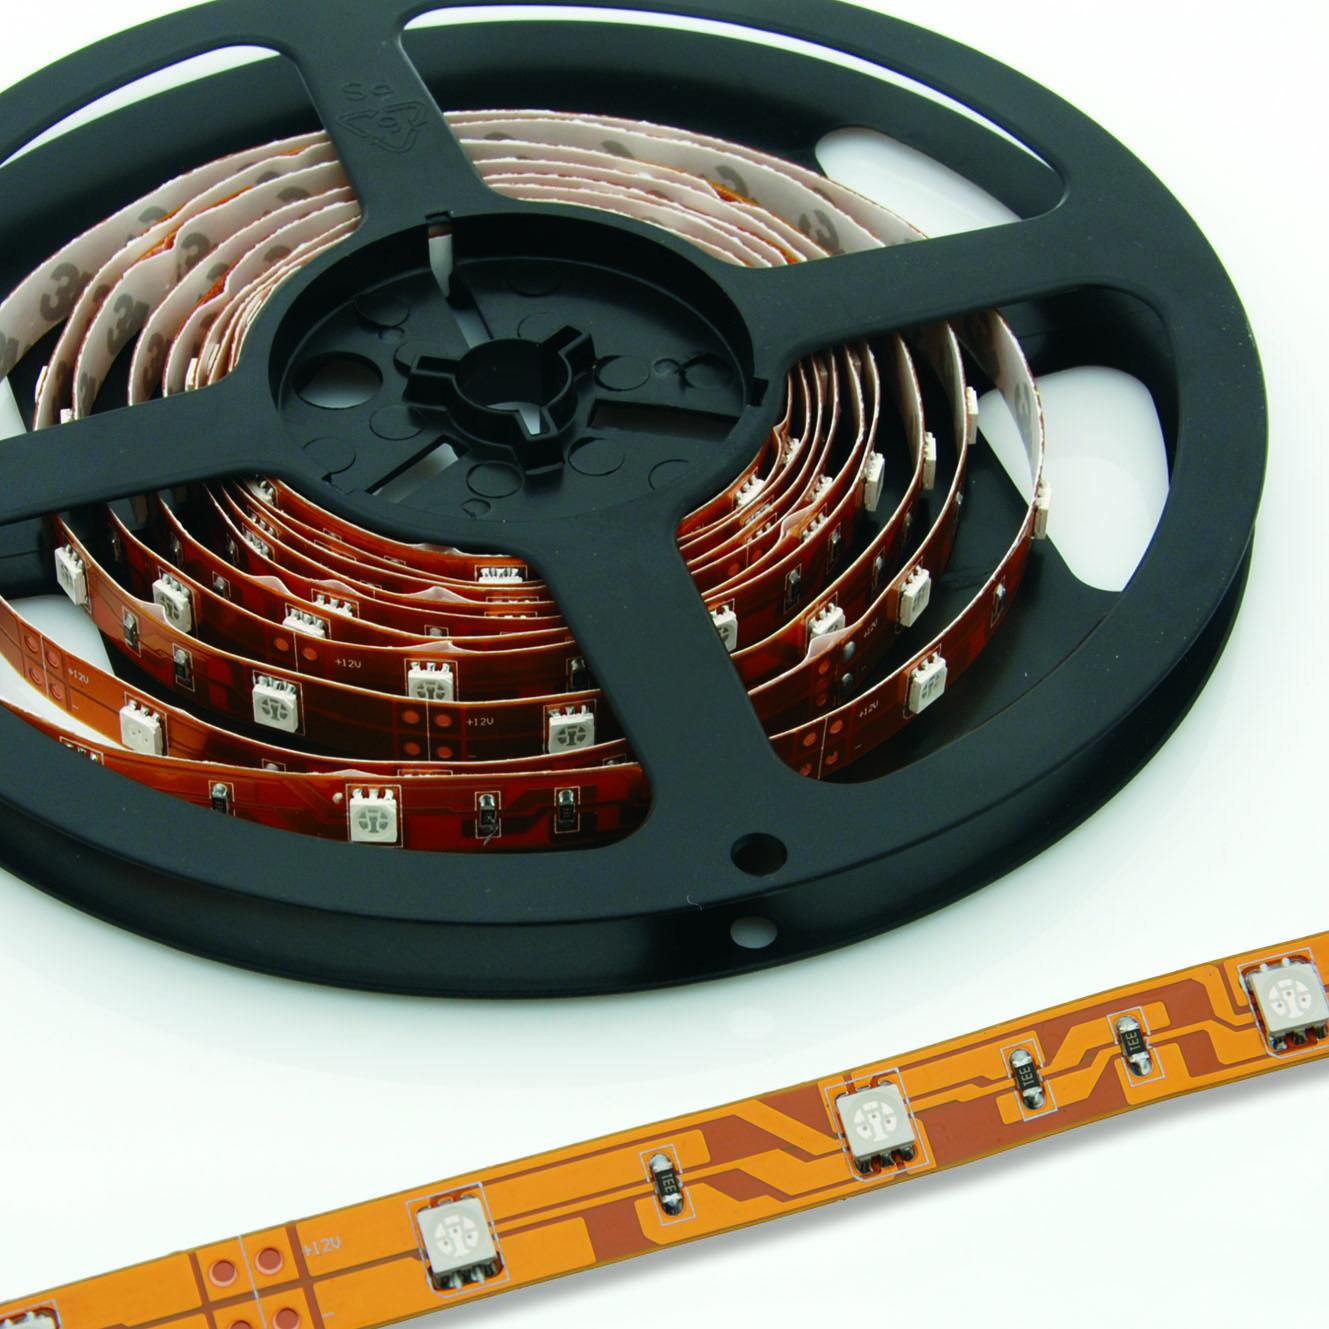 Amazing led design   om led belysning, designlampor med mera ...